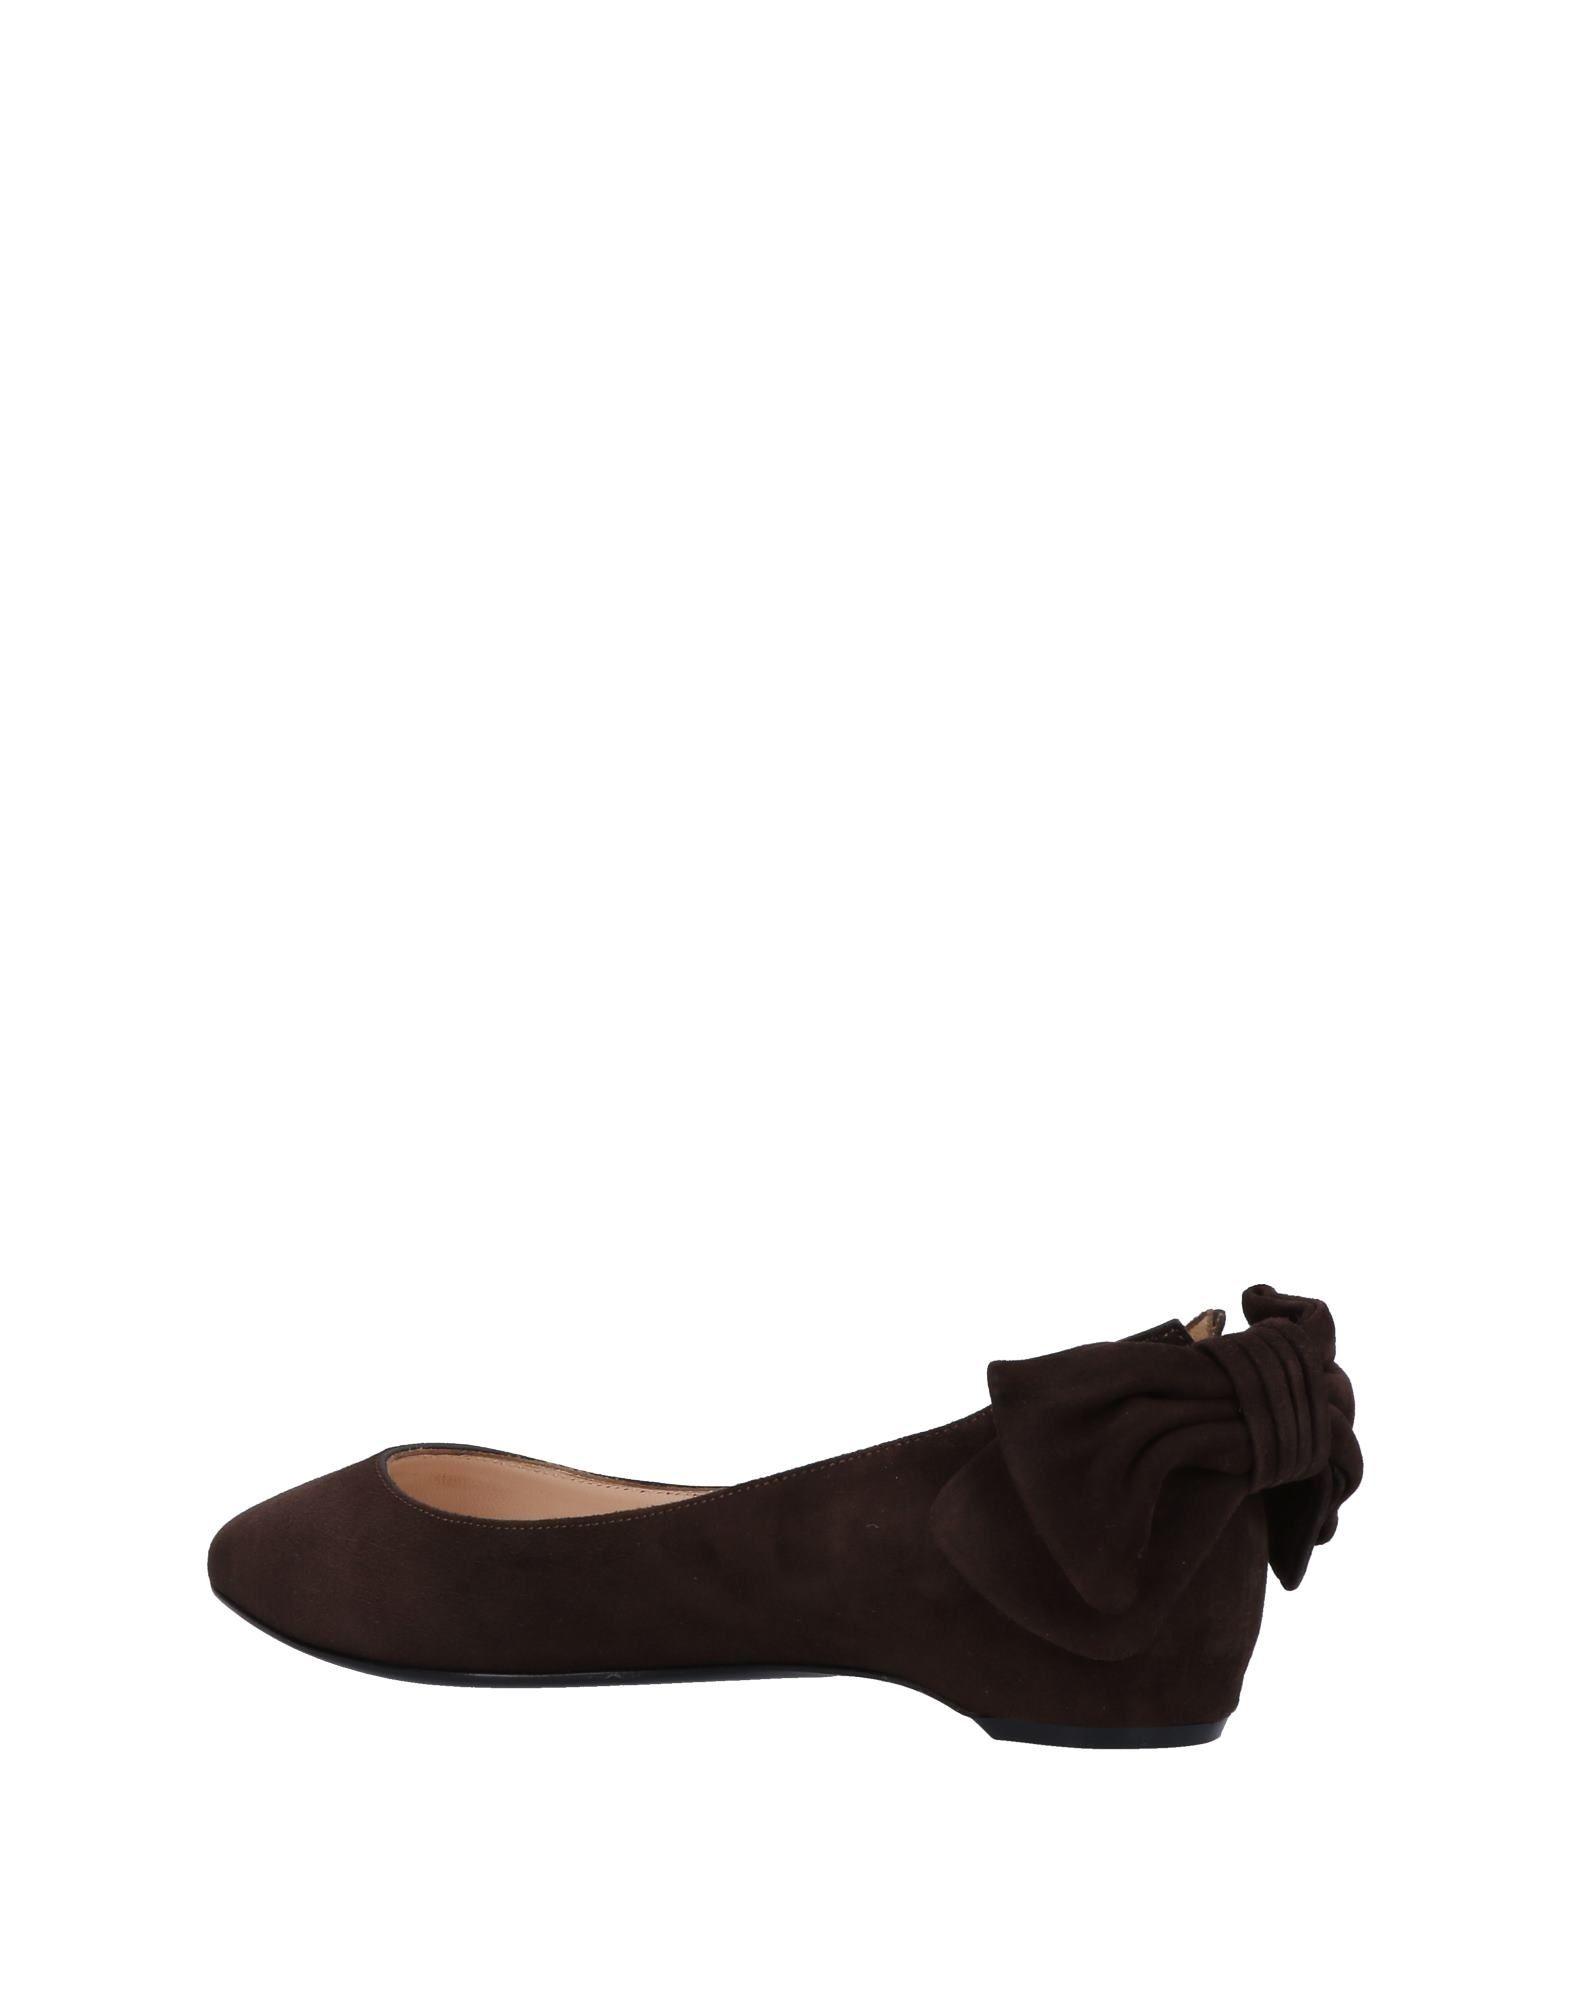 Festa Milano Gute Ballerinas Damen  11510847JV Gute Milano Qualität beliebte Schuhe d7de99